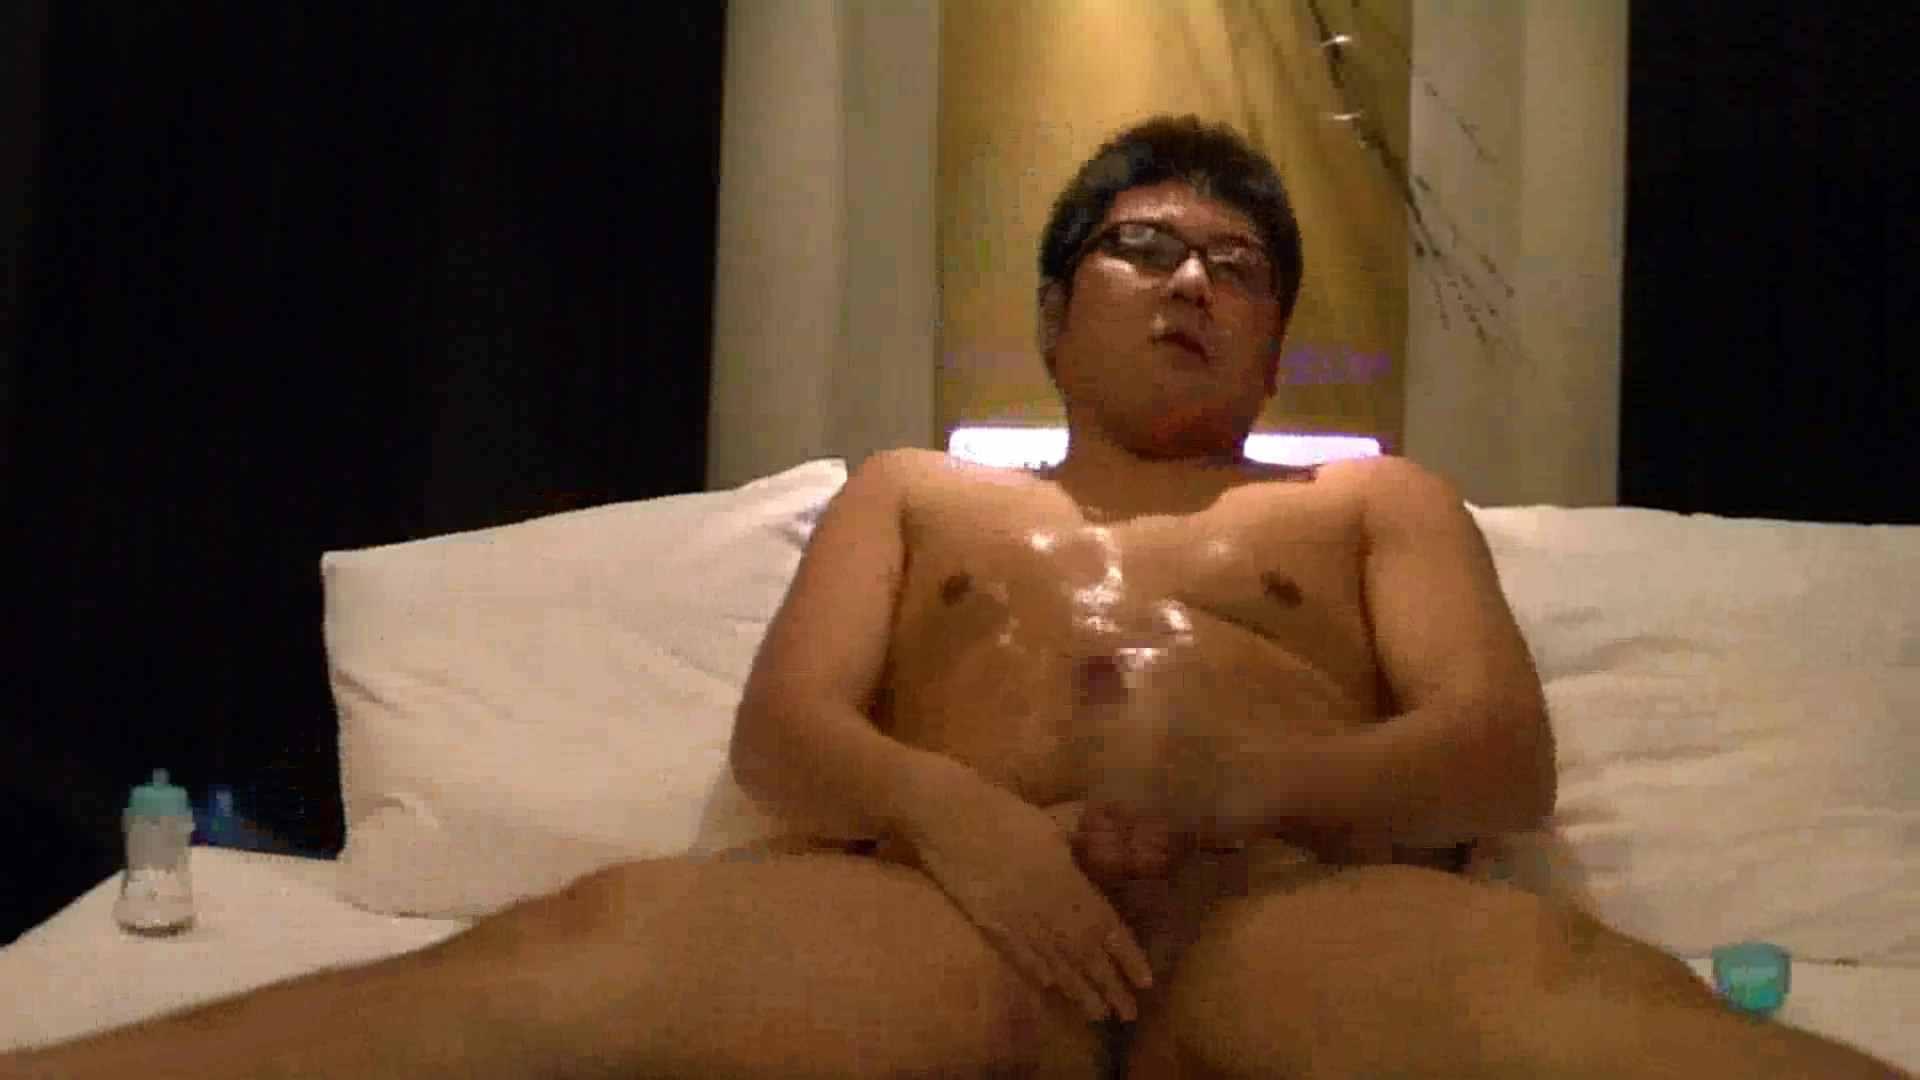 ONA見せカーニバル!! Vol5 エッチ ゲイ無修正ビデオ画像 108枚 5